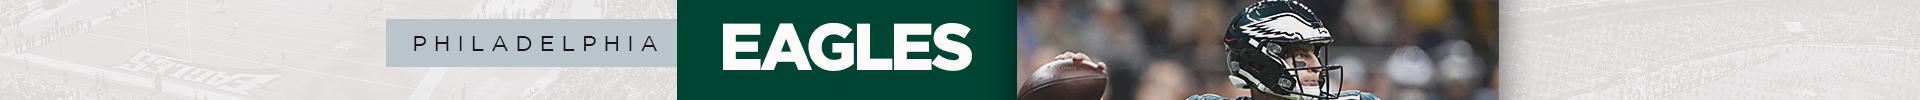 Times - Eagles